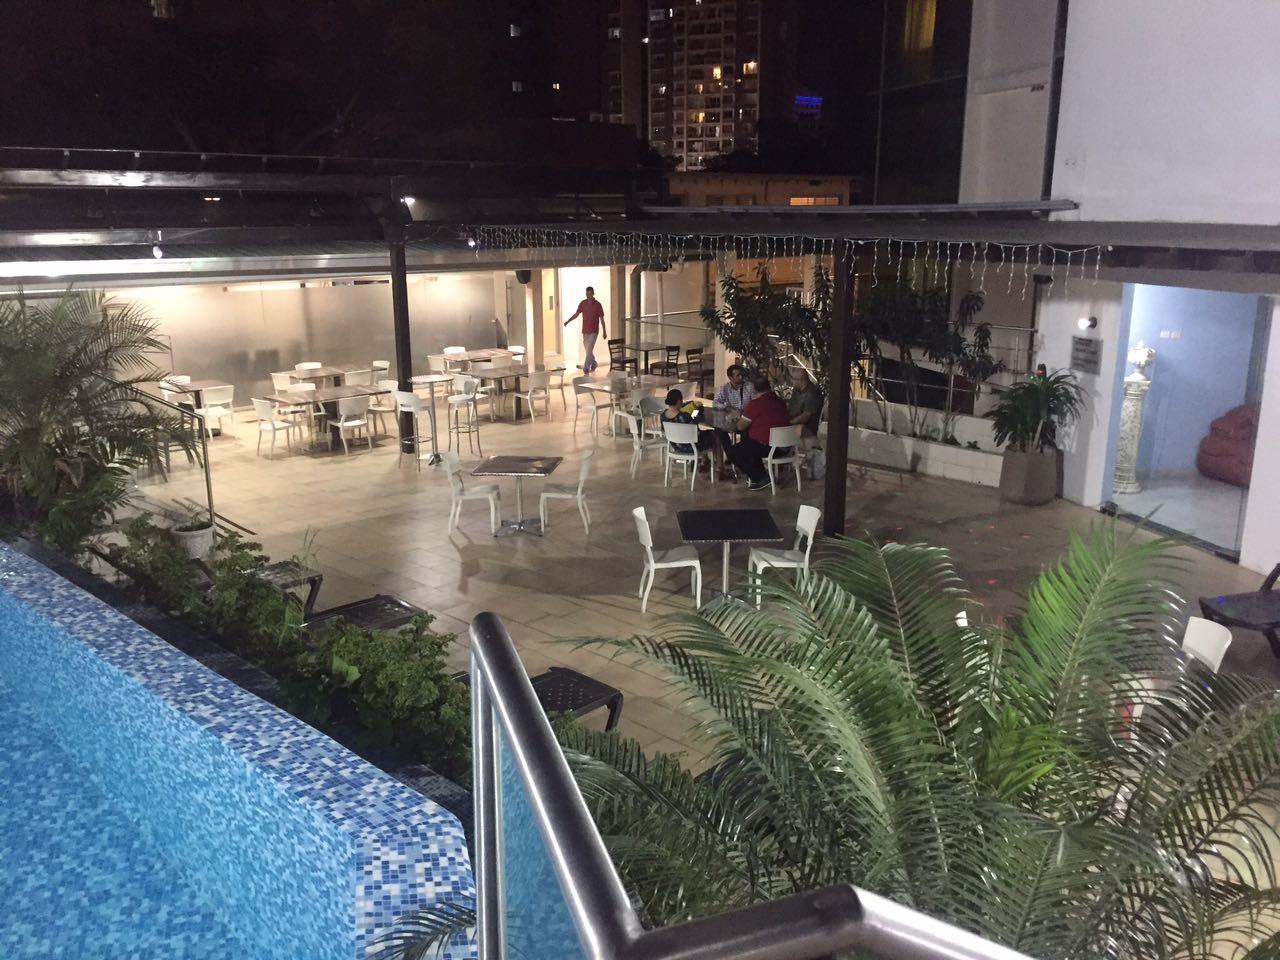 Spanish Panama Spanish school Via Argentina . Hotel accommodations in Panama City. https://www.spanishpanama.com for Spanish courses and classes in Panama